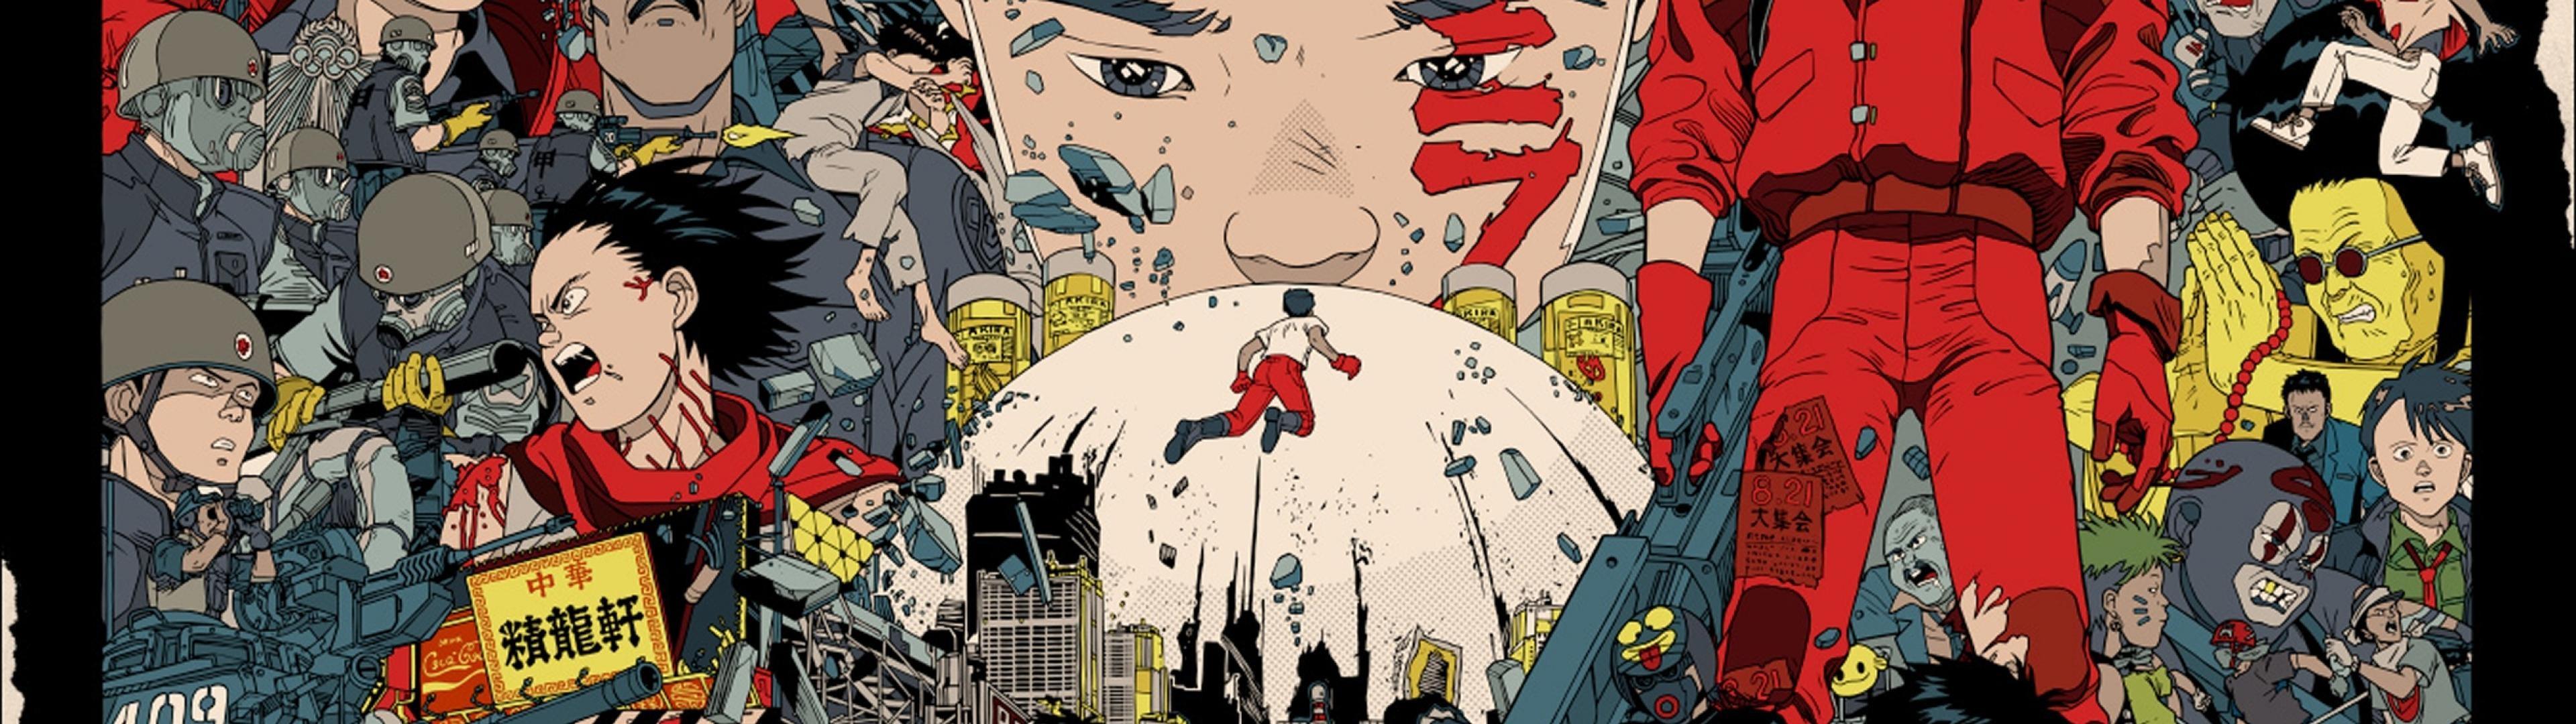 Wallpaper Painting Illustration Collage Comics Akira